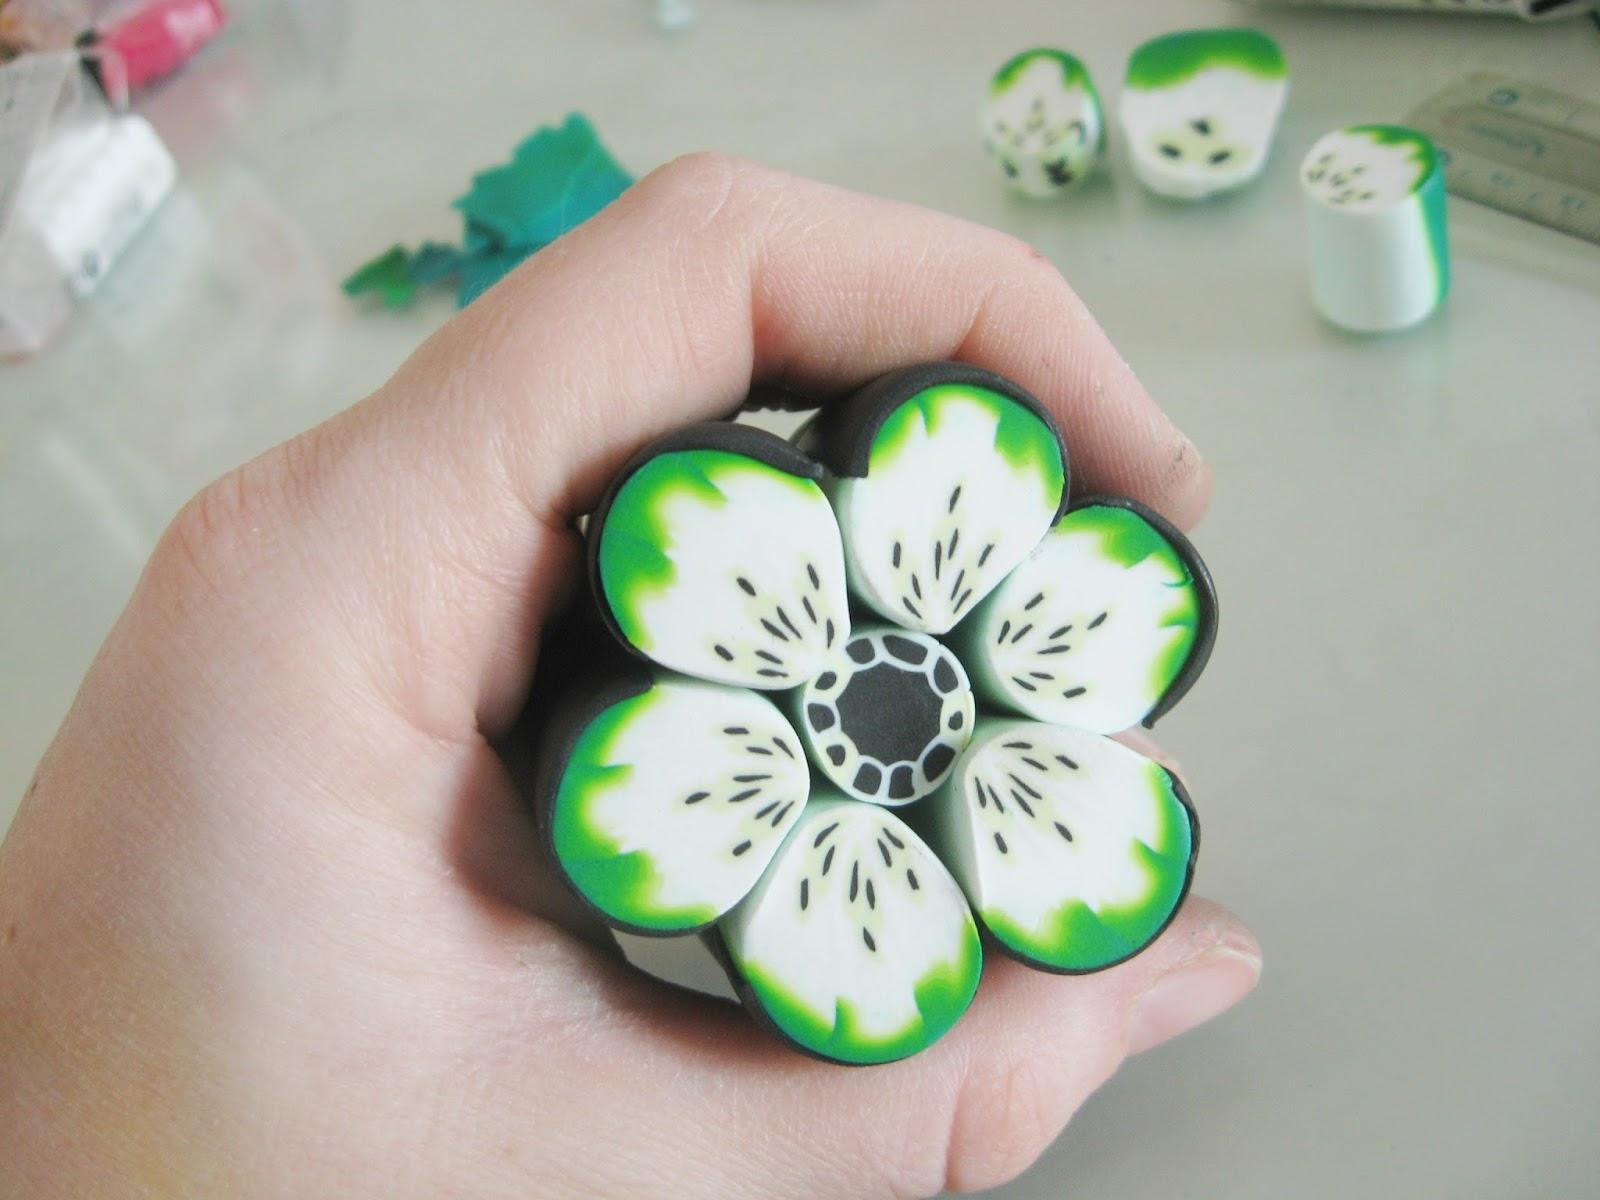 cane fleur verte